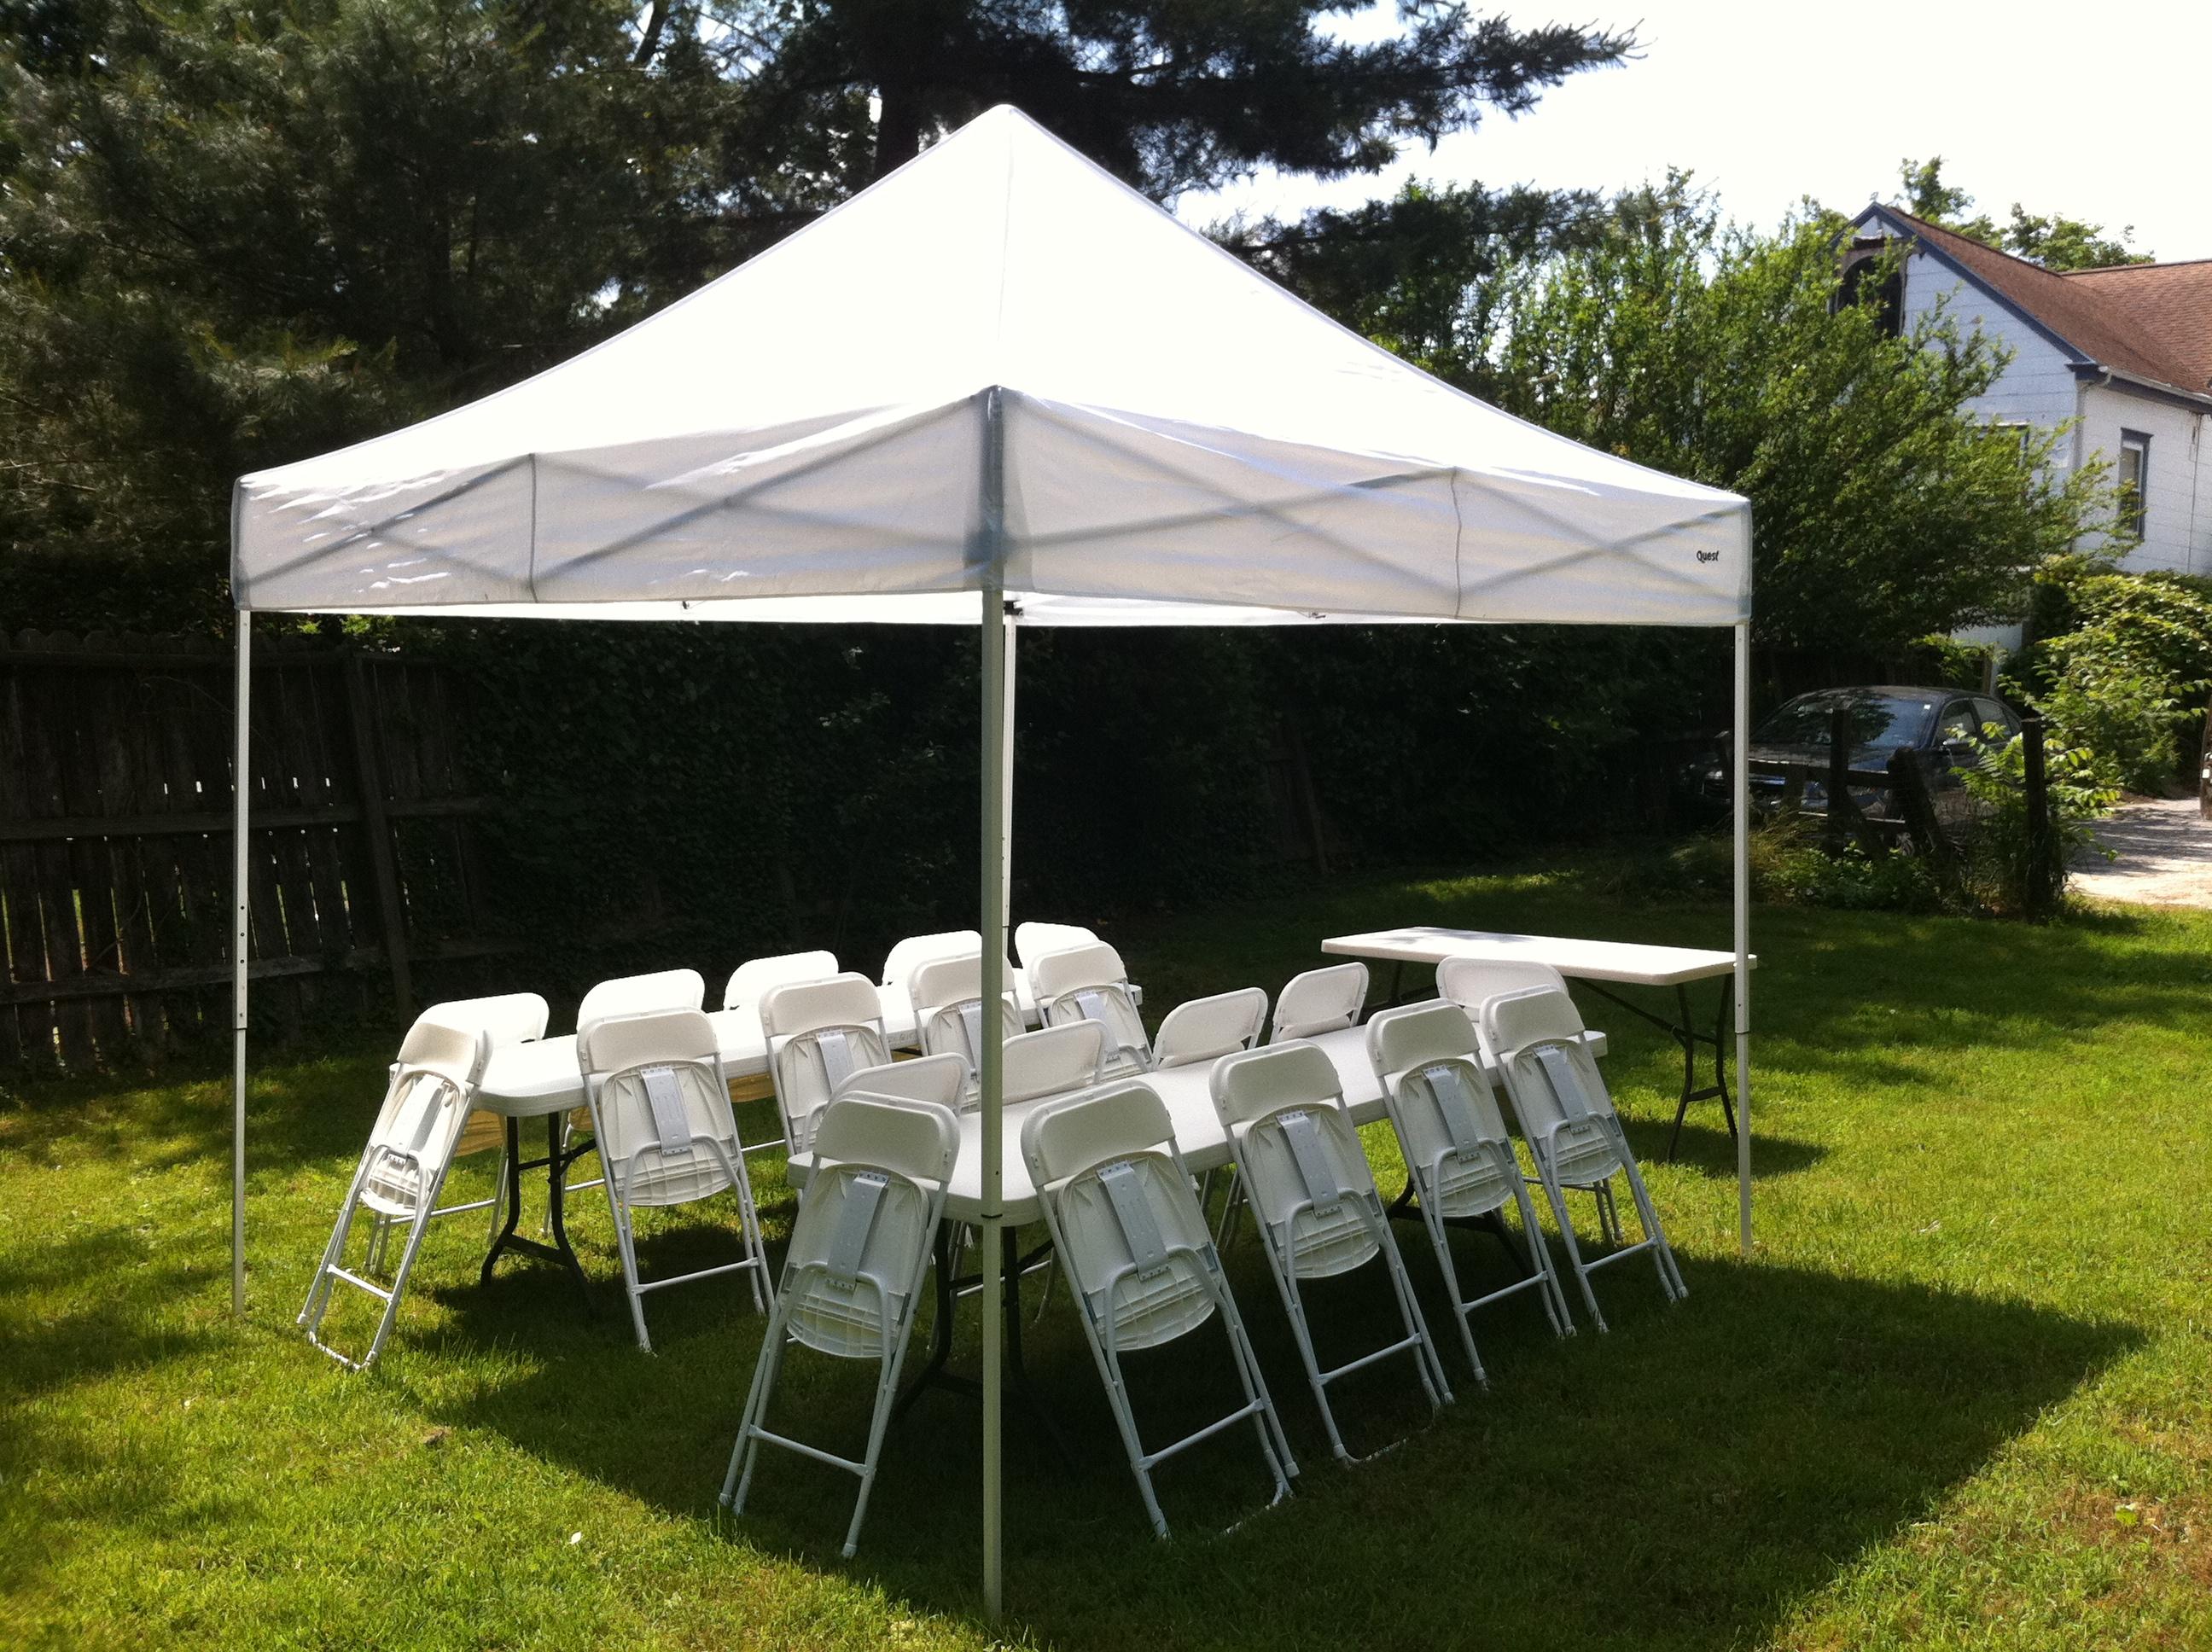 10u2032 x 10u2032 Pole Tent & 10u2032 x 10u2032 Pole Tent » Rainy Day Party Rentals